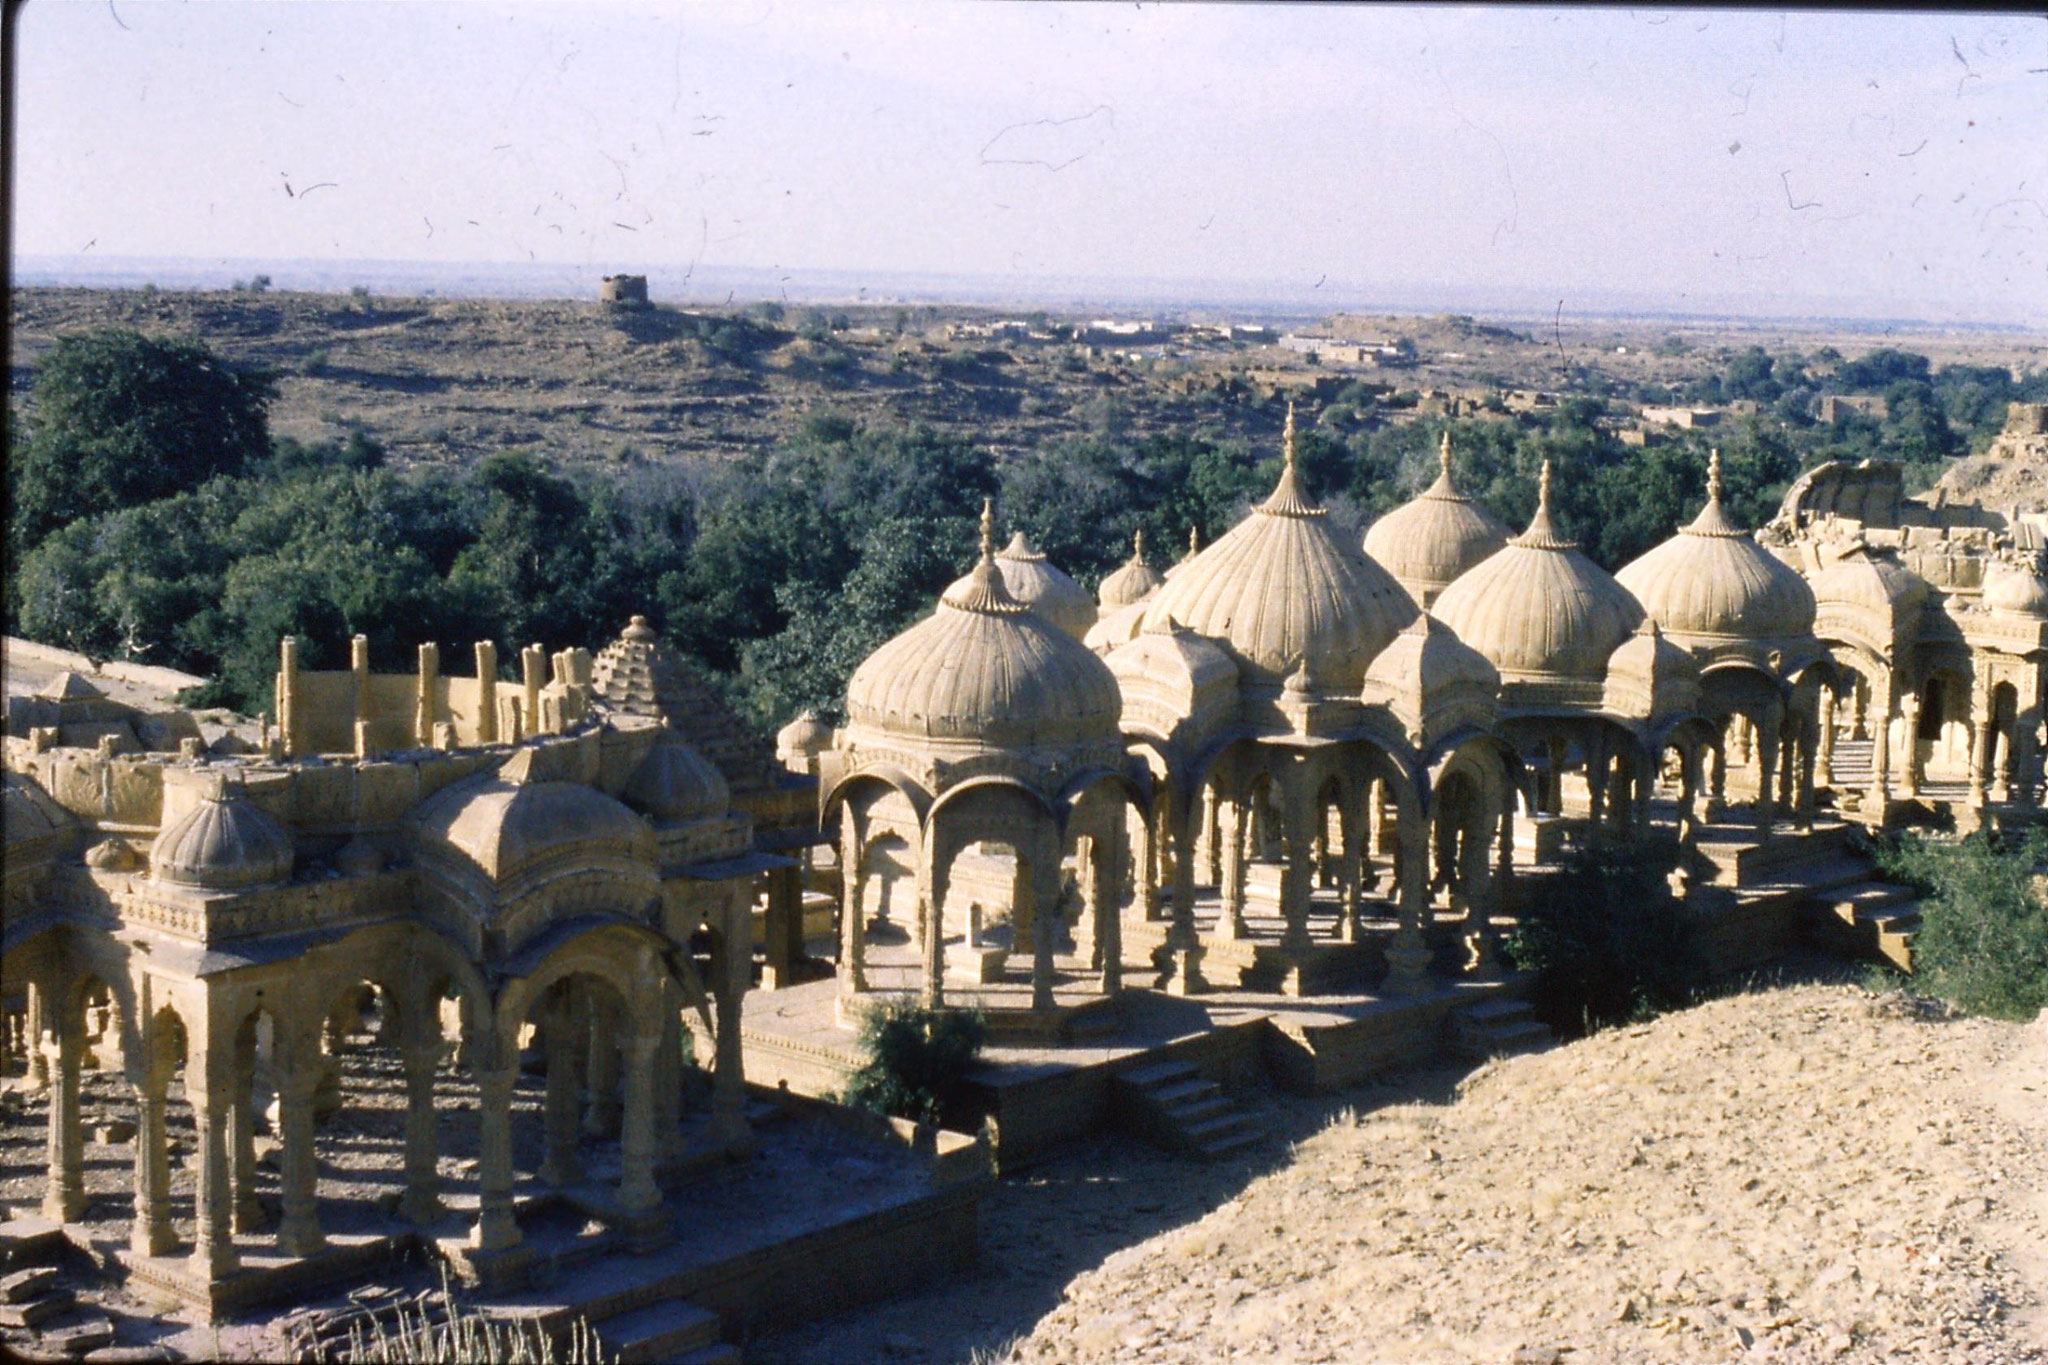 4/12/1989: 12: cenotaphs